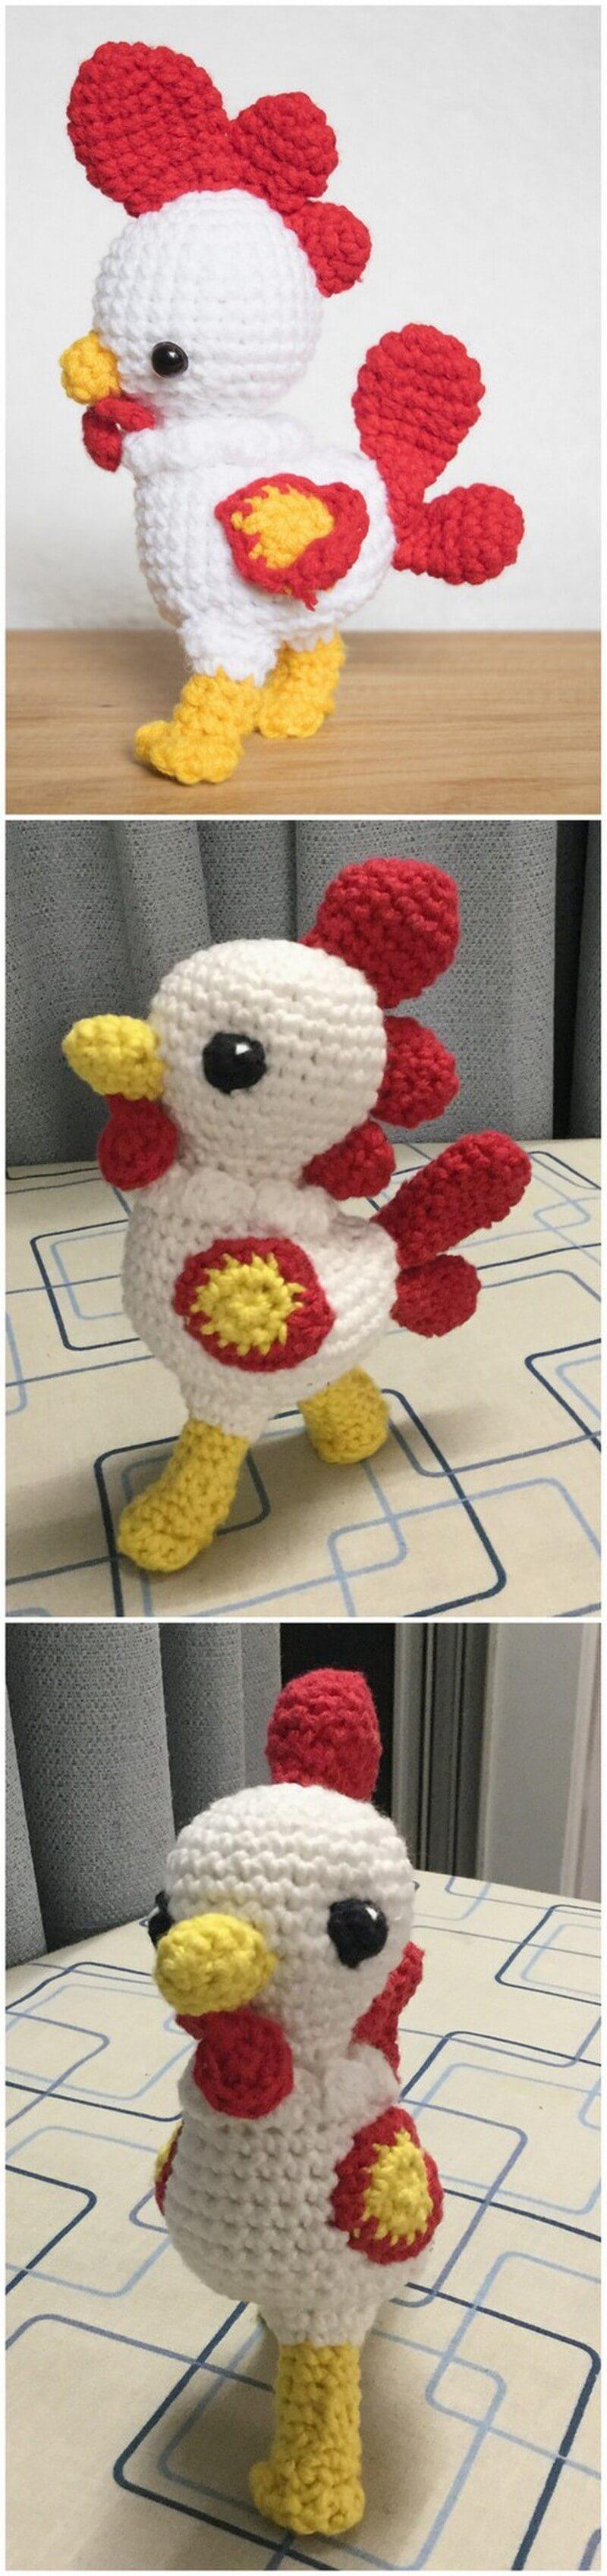 Free Crochet Amigurumi Pattern (8)